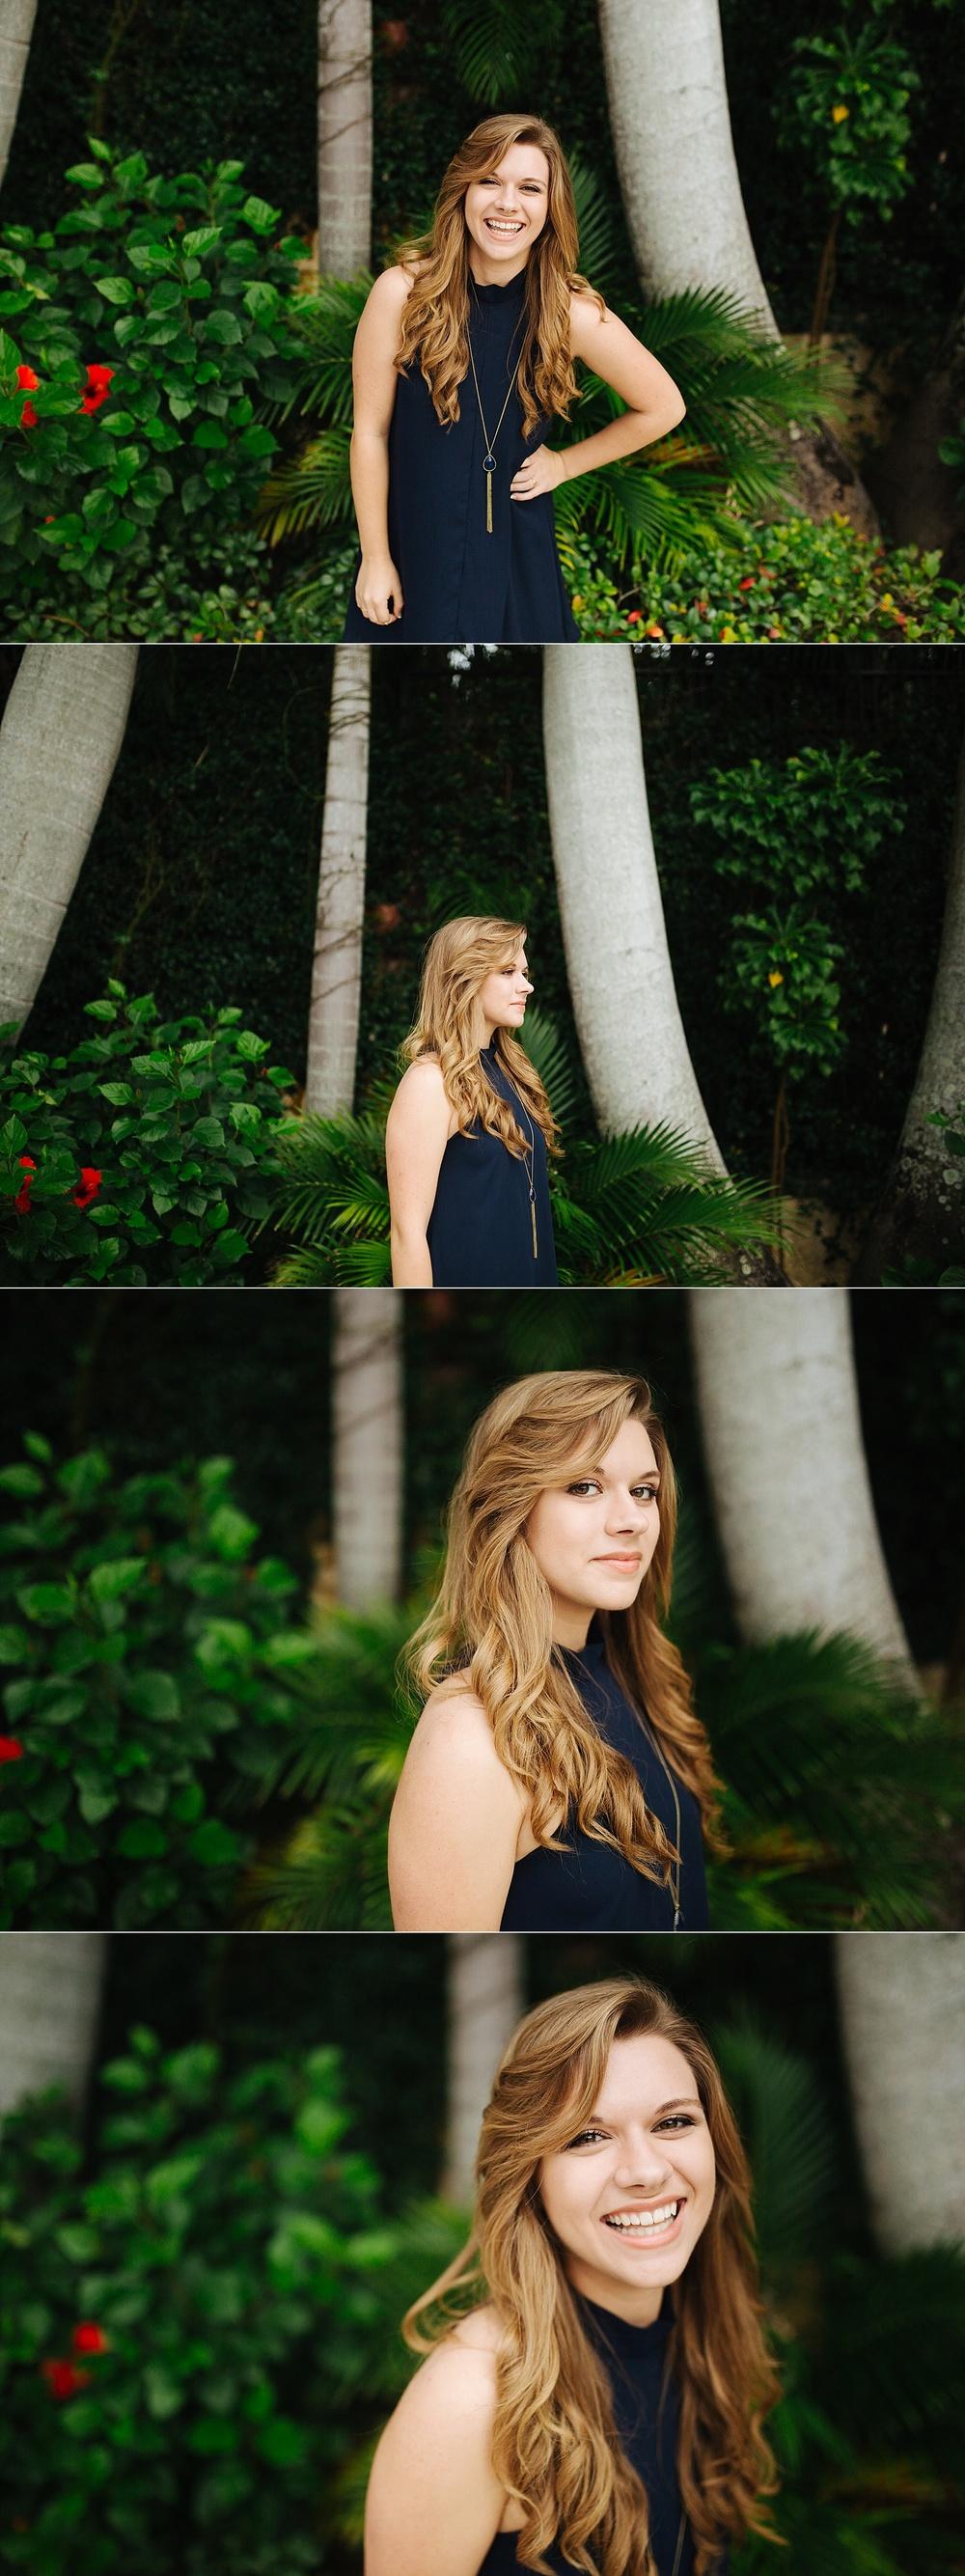 stpete senior portraits sunken gardens leah-16